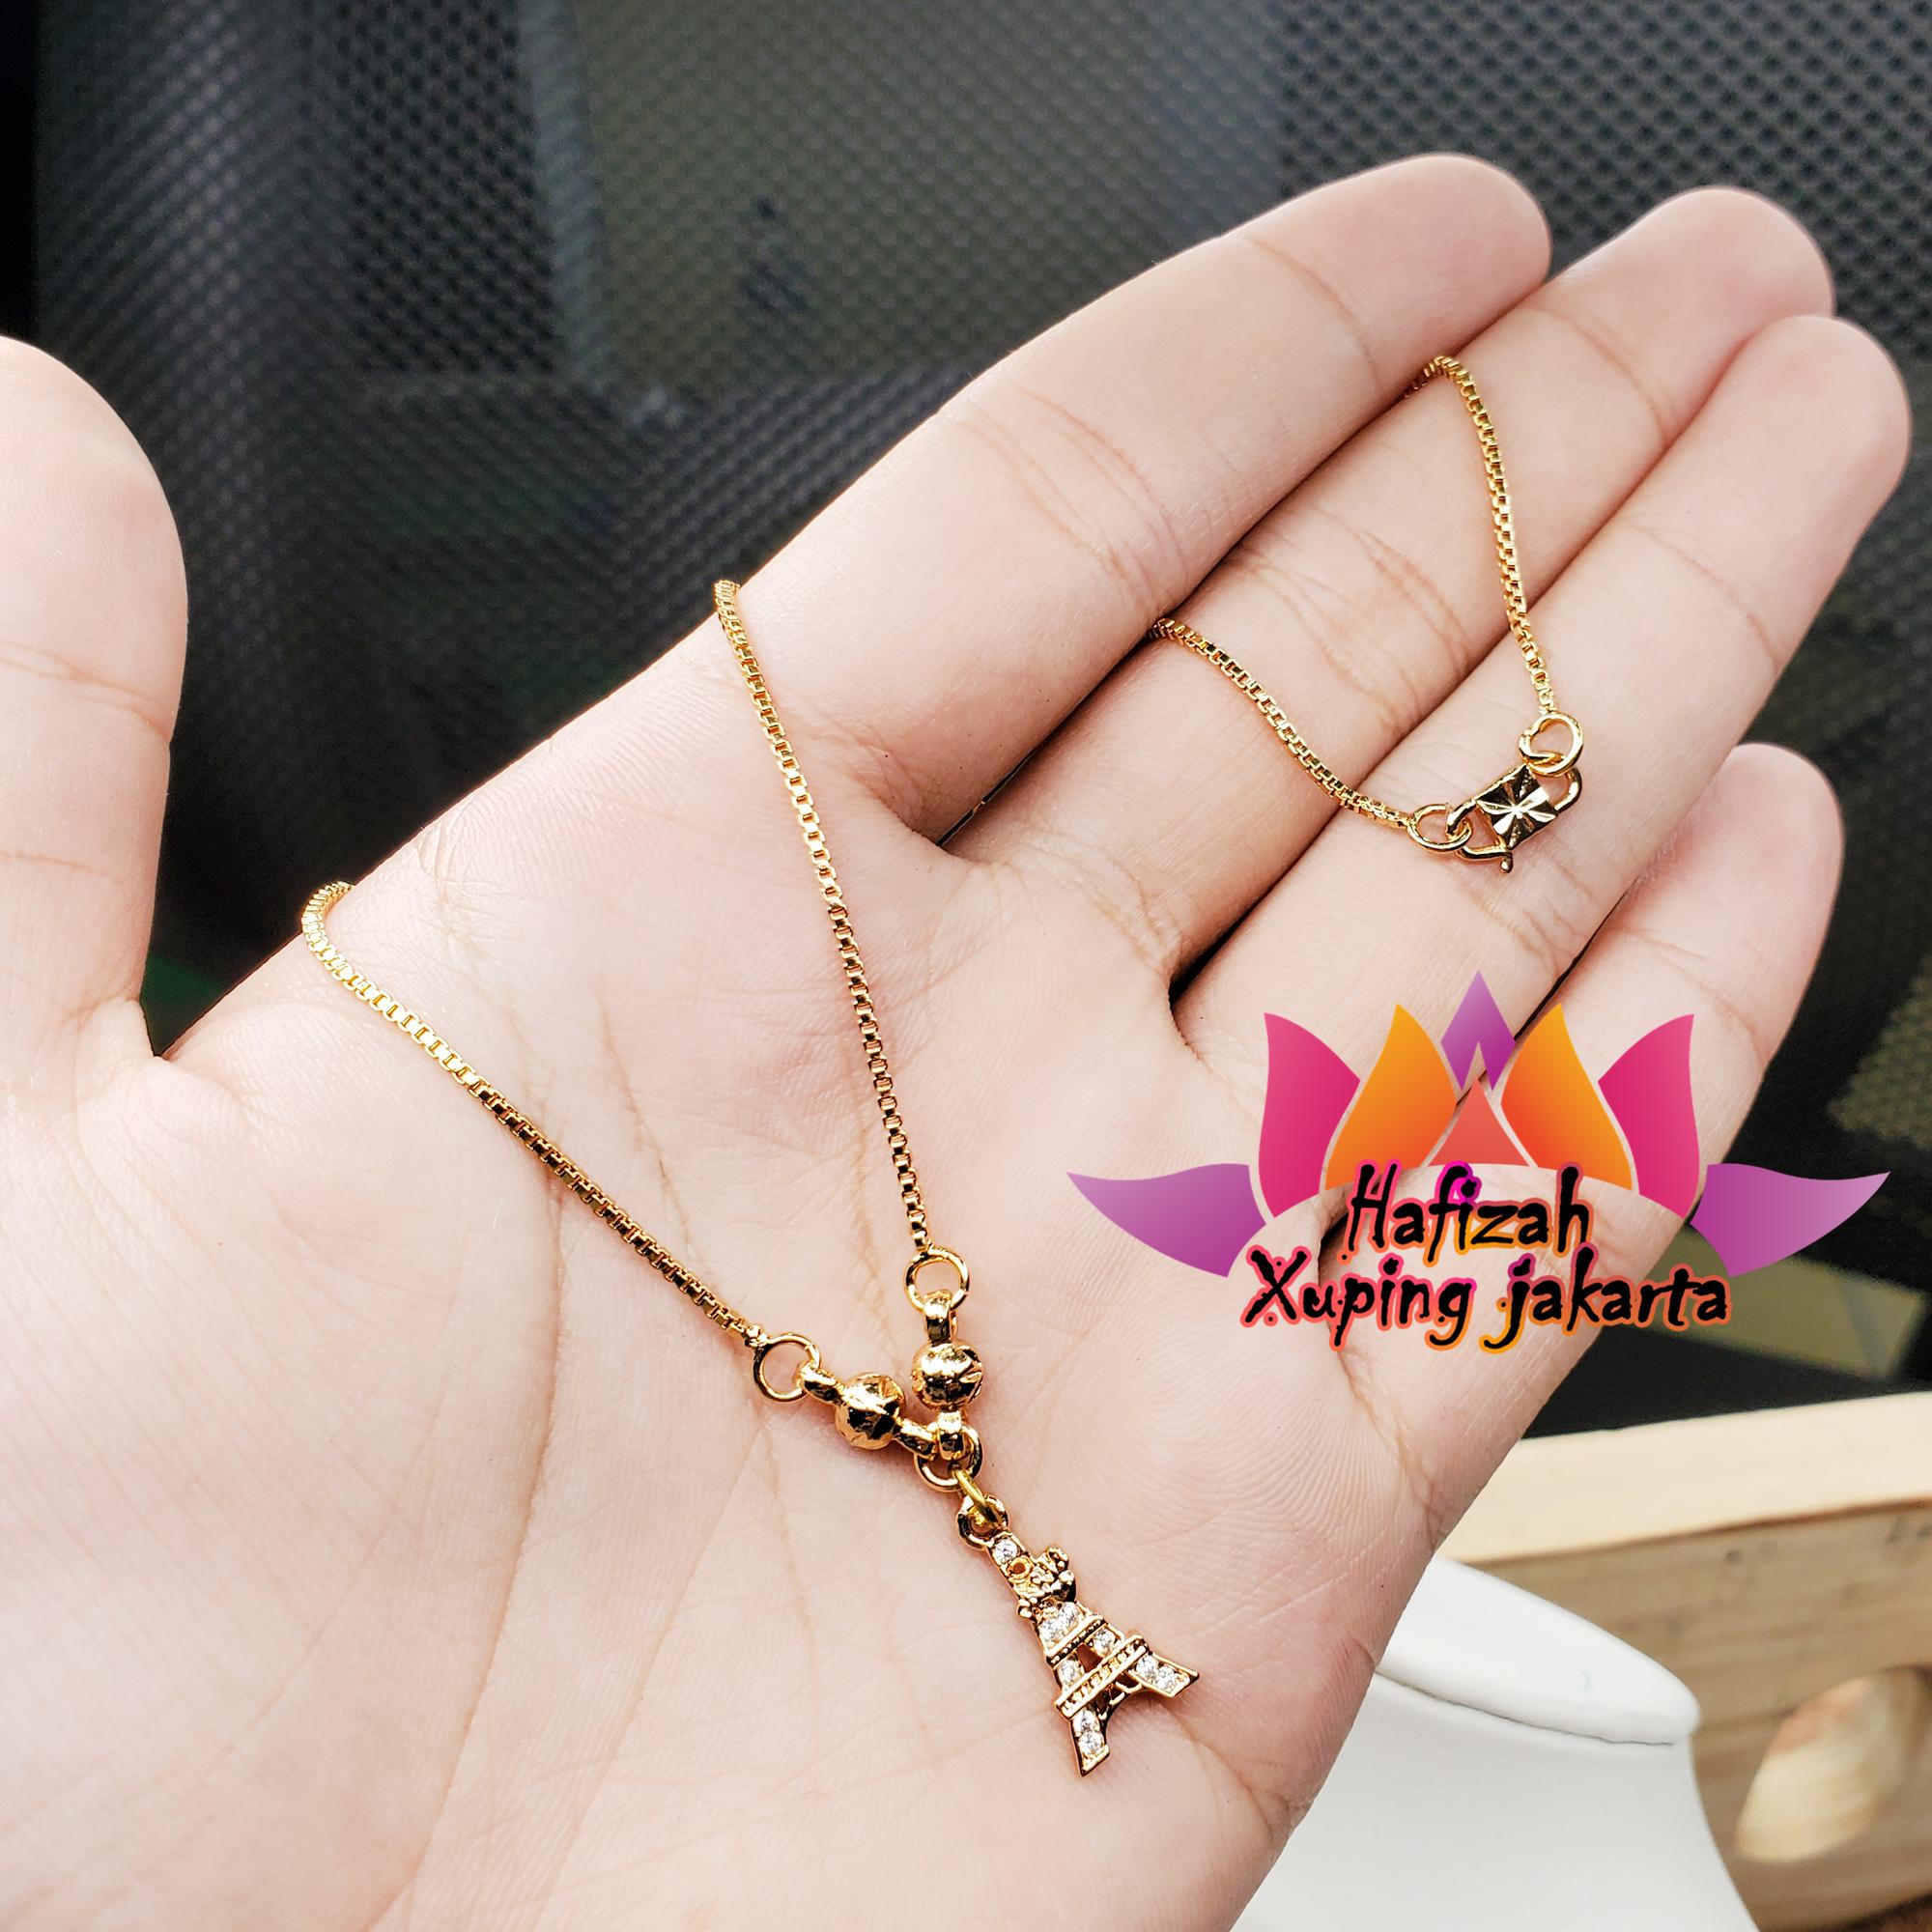 kalung xuping 24k itali bola motif lionitn paris anak perhiasan fashion